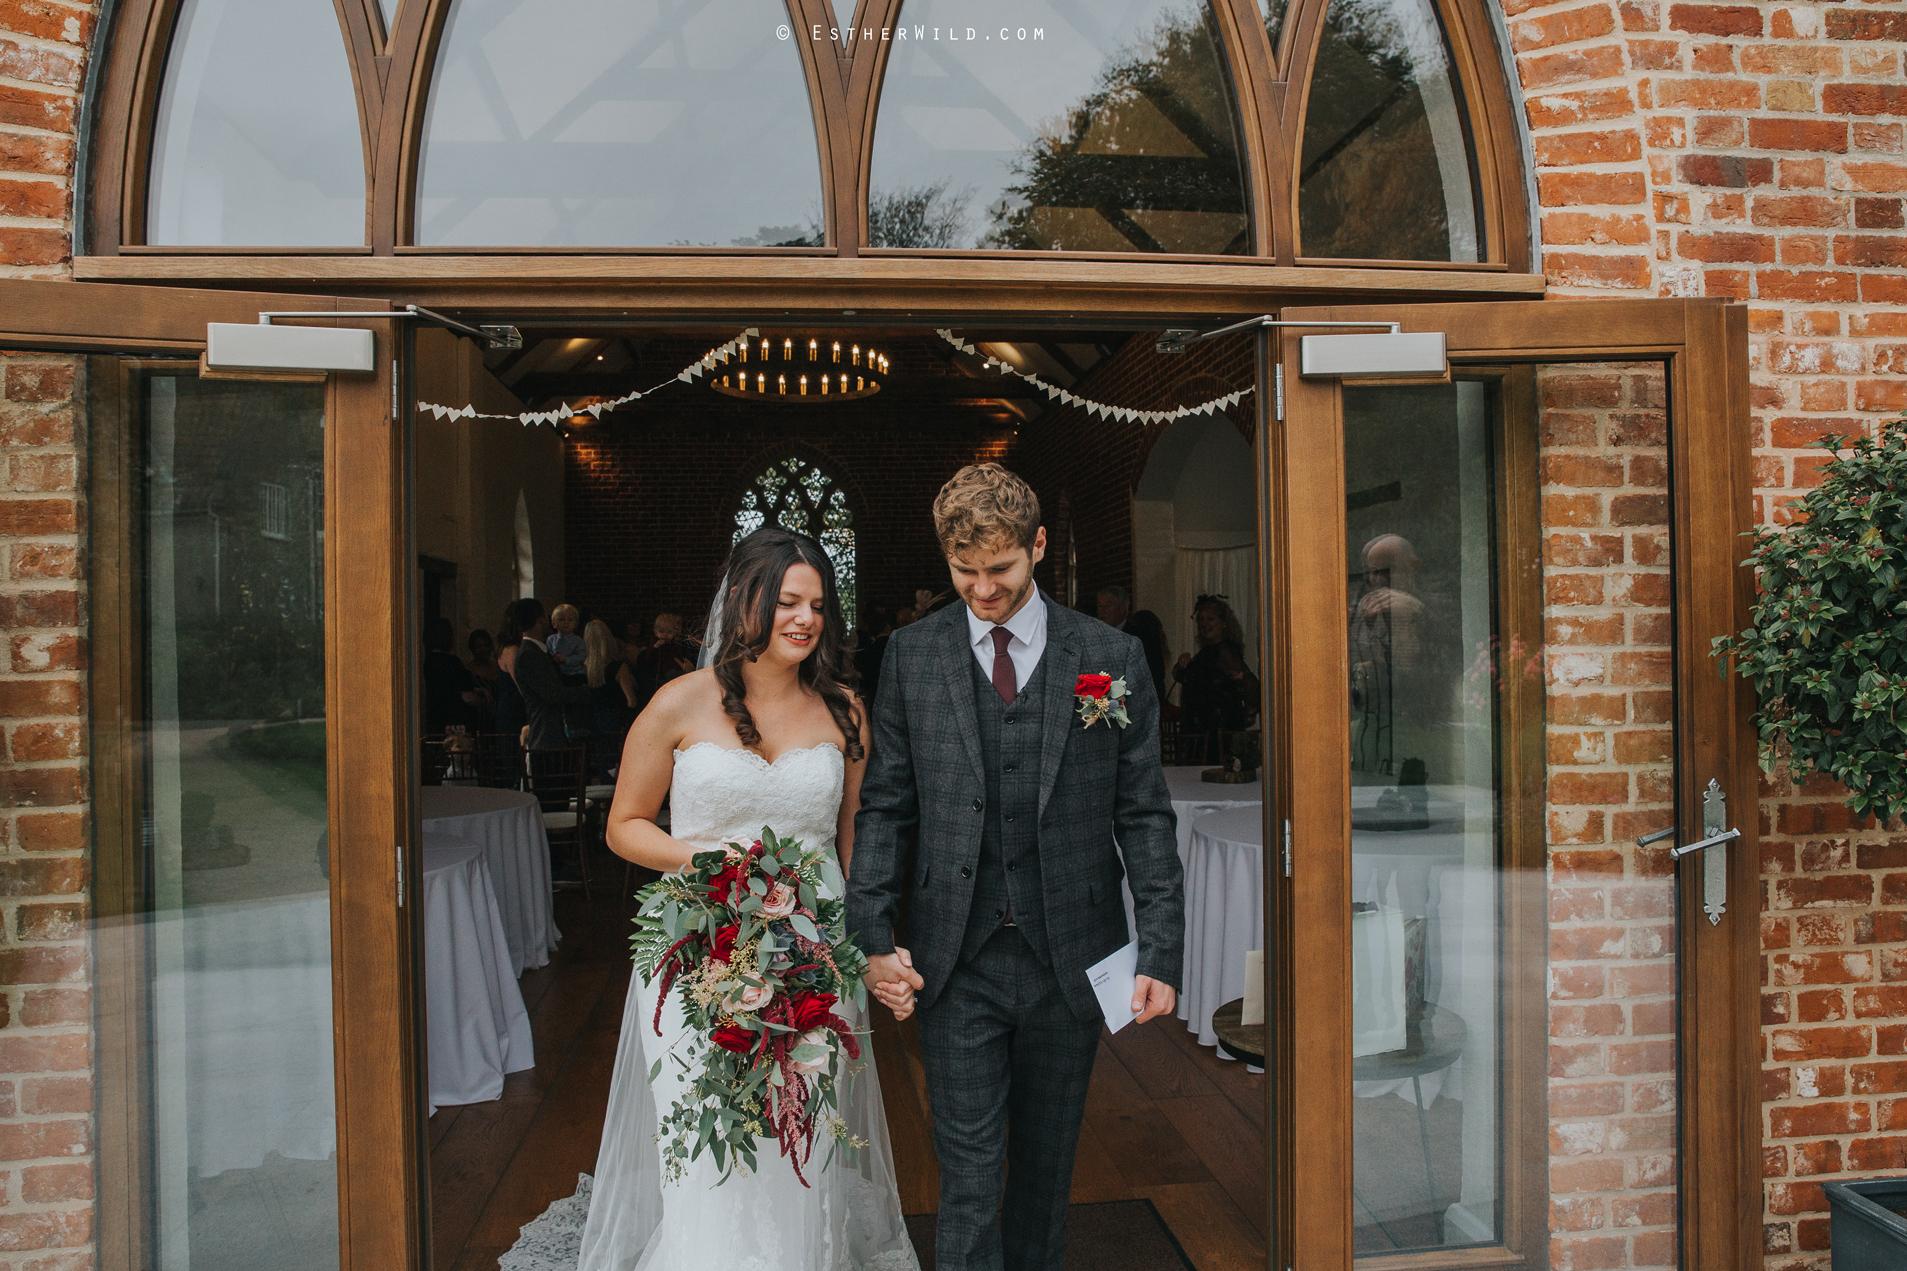 Reading_Room_Weddings_Alby_Norwich_Photographer_Esther_Wild_IMG_1111.jpg